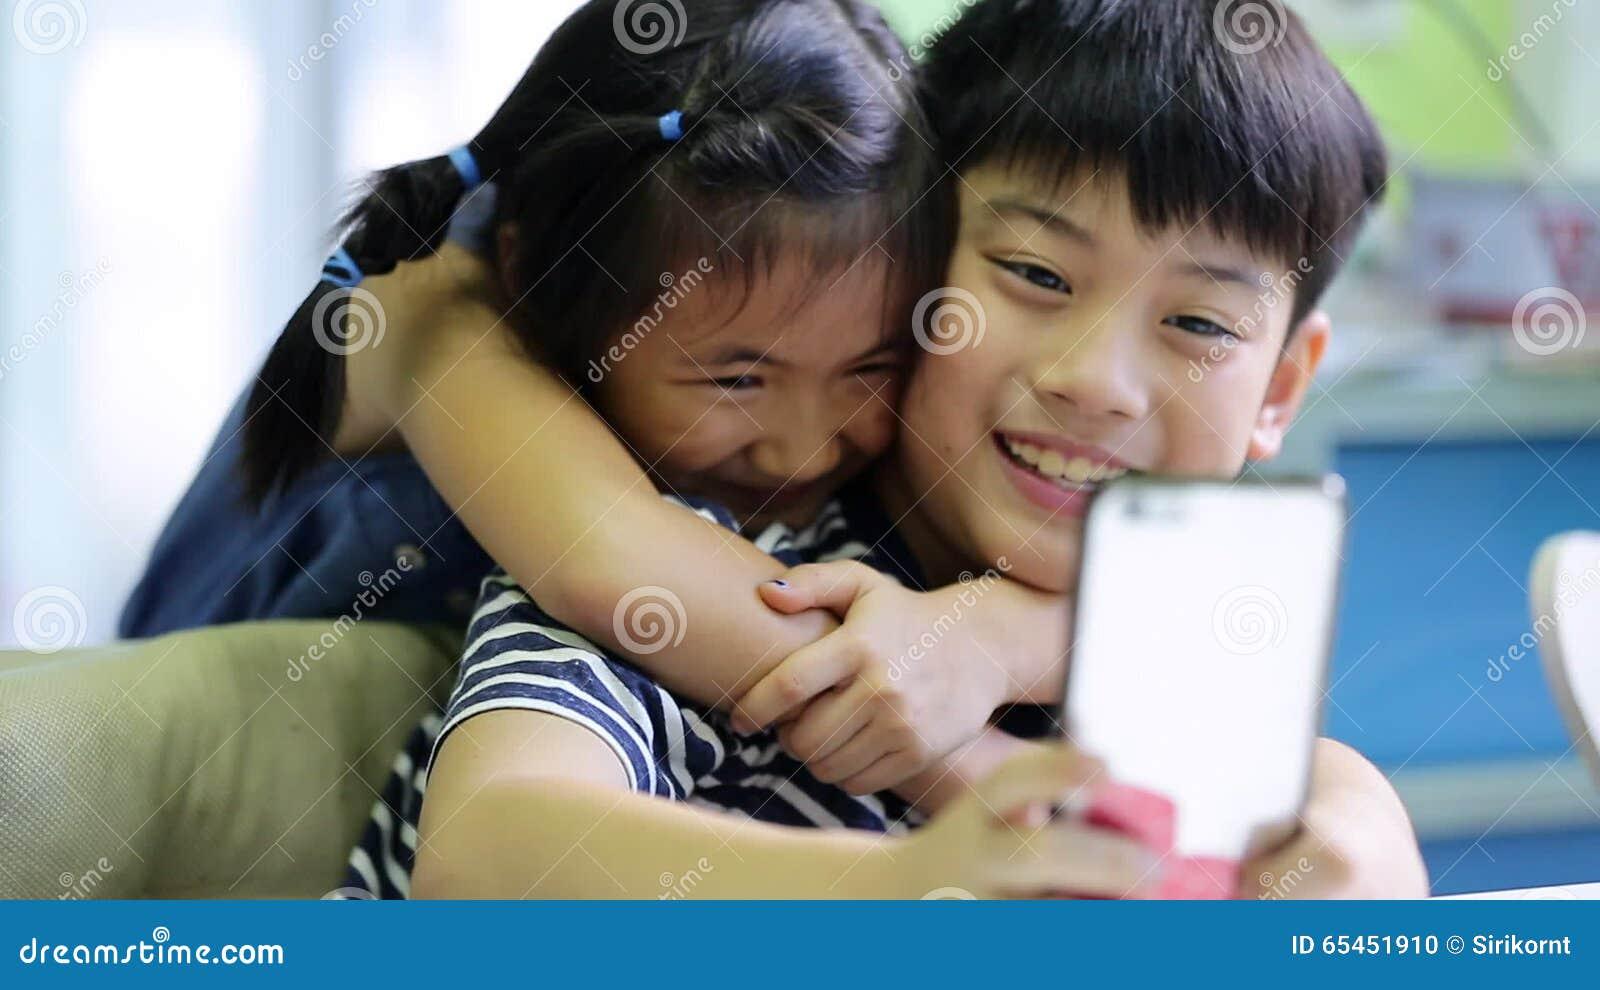 pornstar-asian-boy-girl